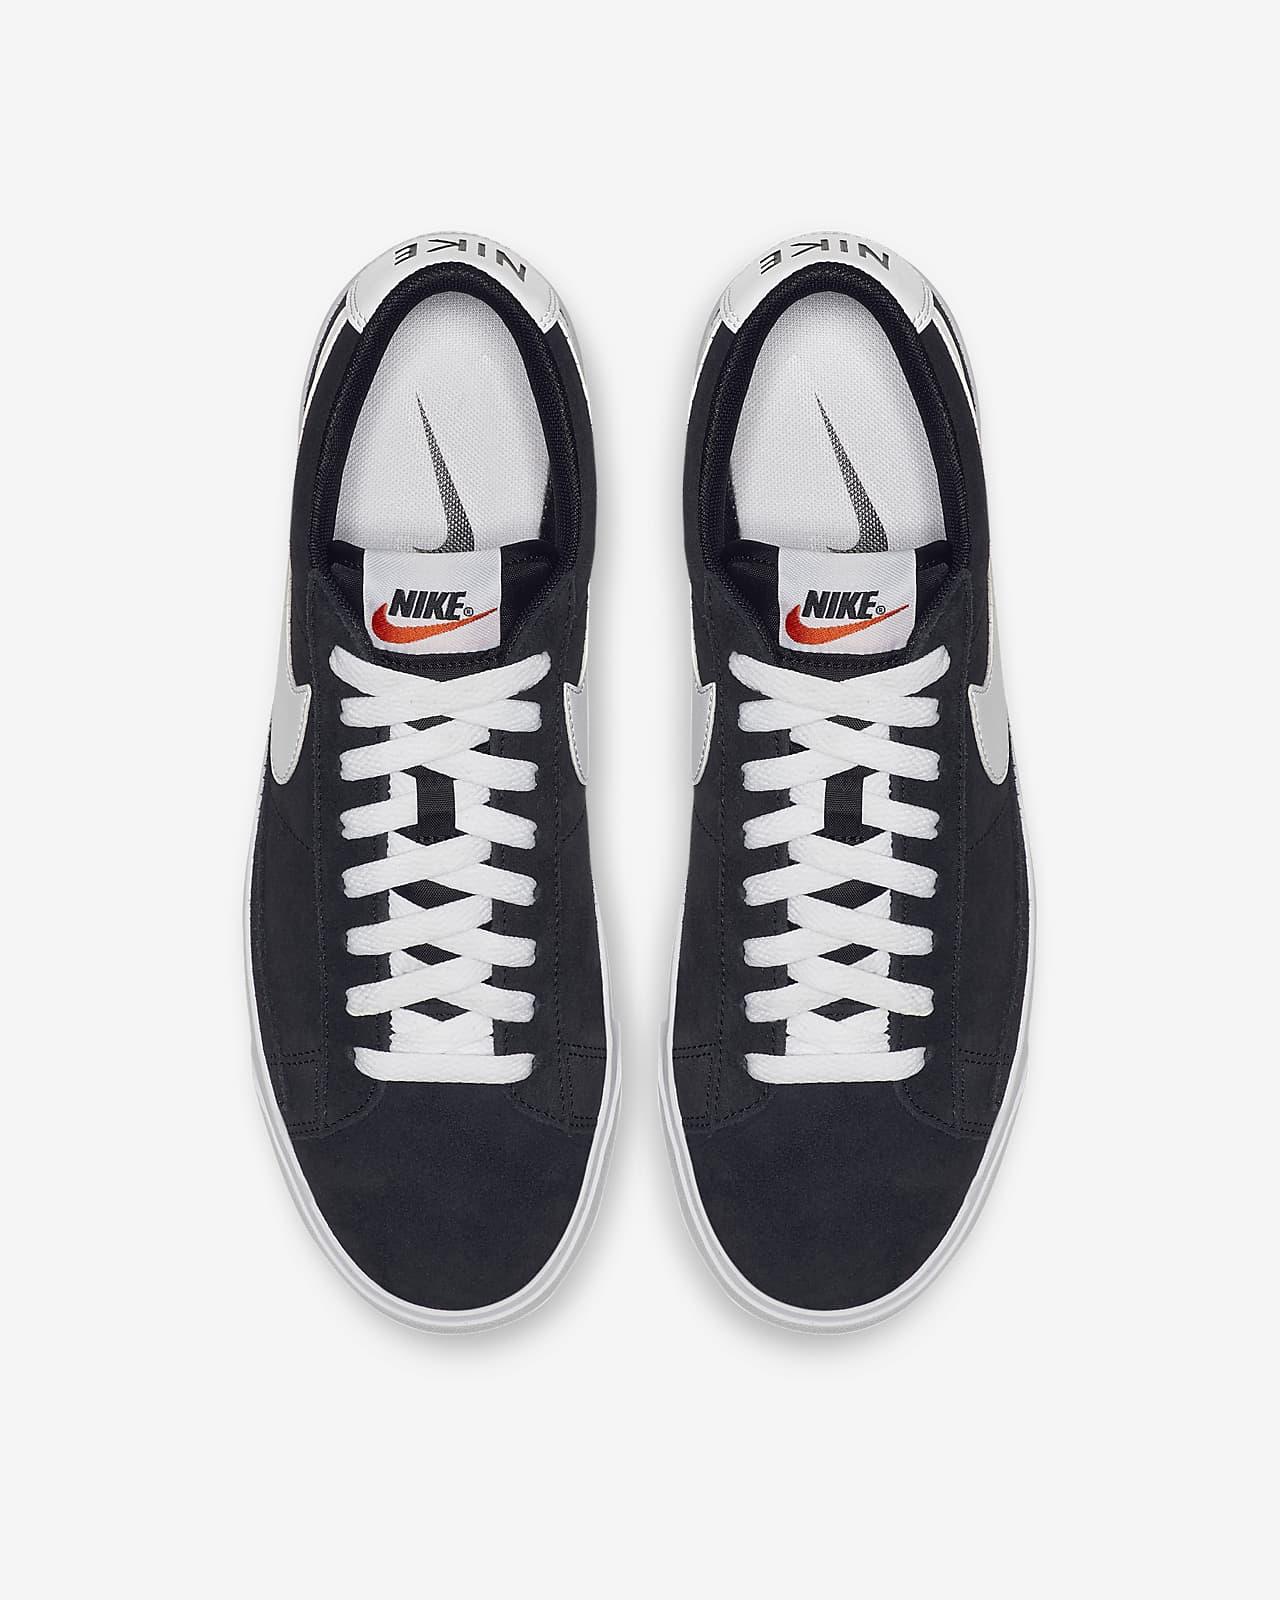 Chaussure Nike Blazer Low Premium Vintage Suede pour Homme. Nike LU